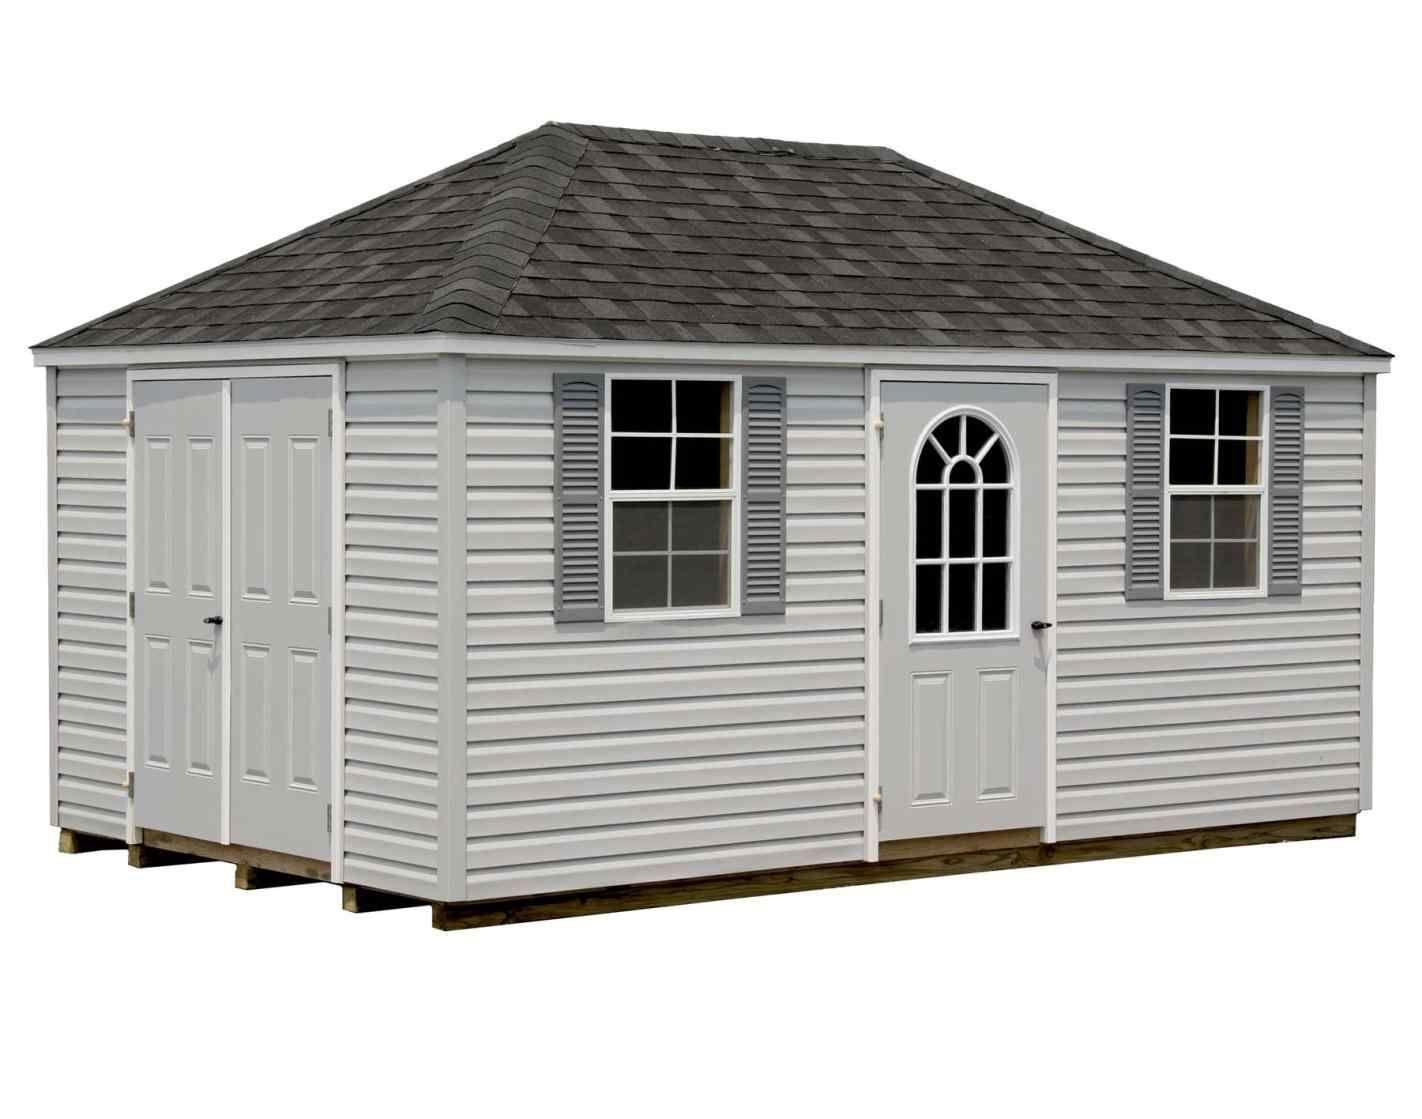 Hip Roof Designs Roof design, Hip roof, Hip roof design